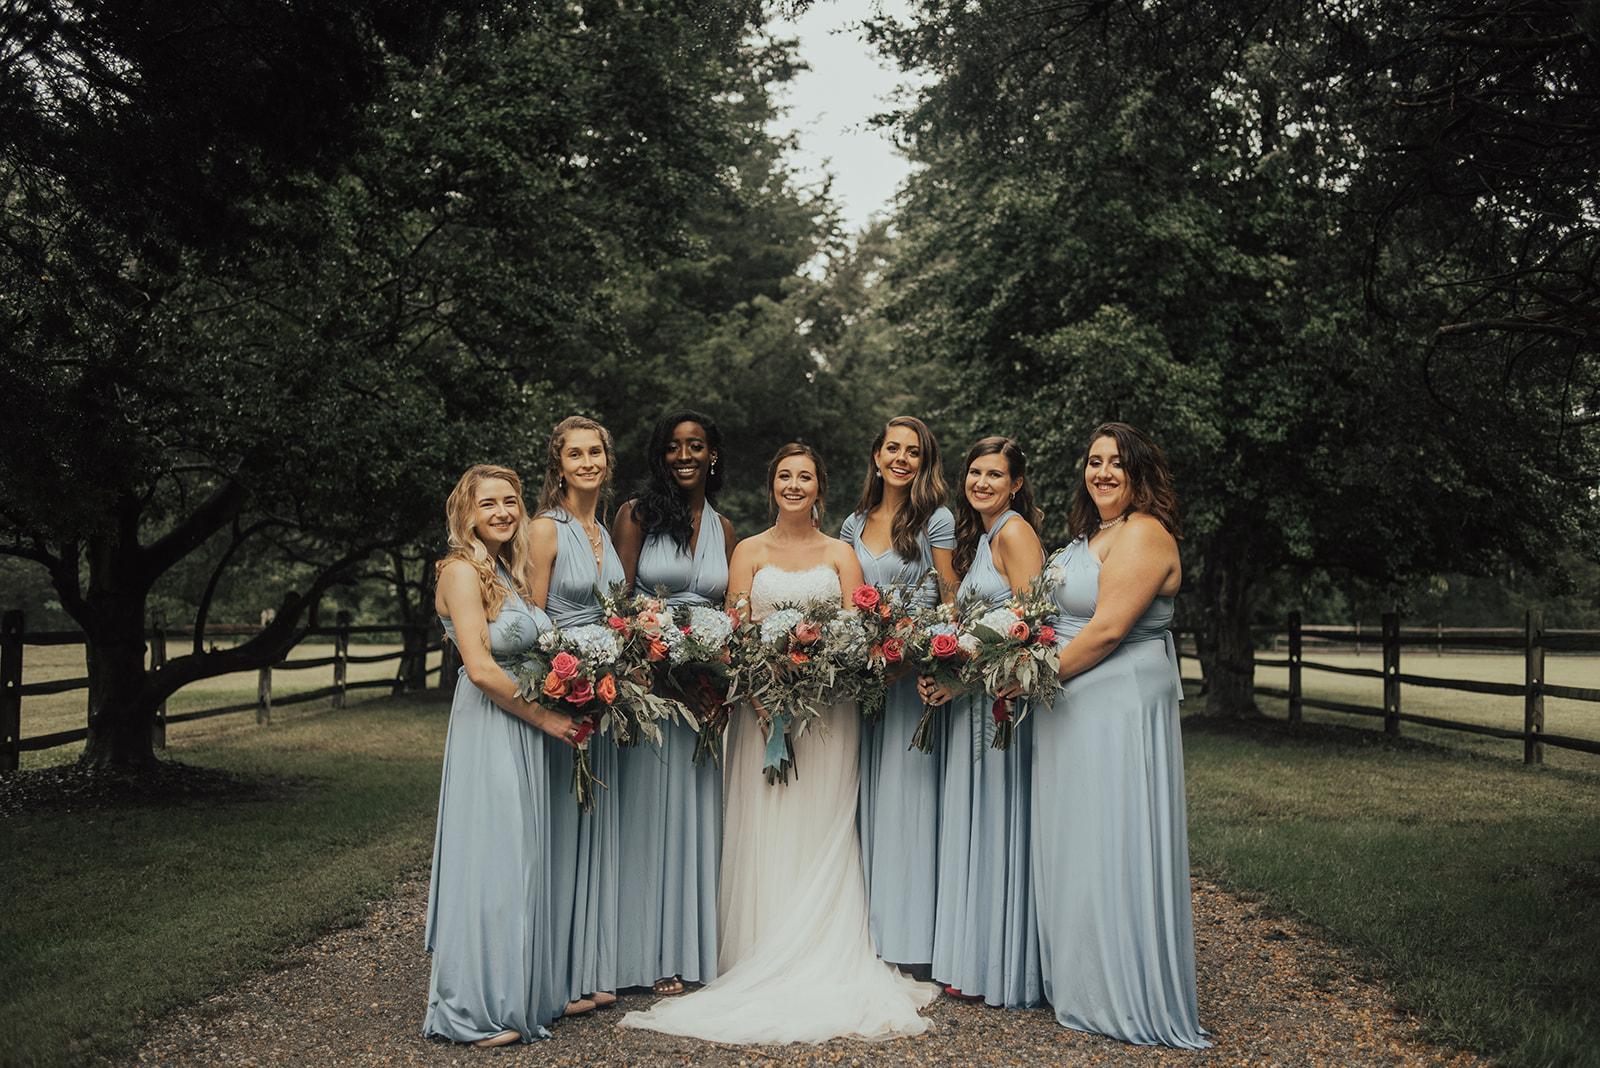 Richmond VA Wedding By SB Photographs122122122.jpg